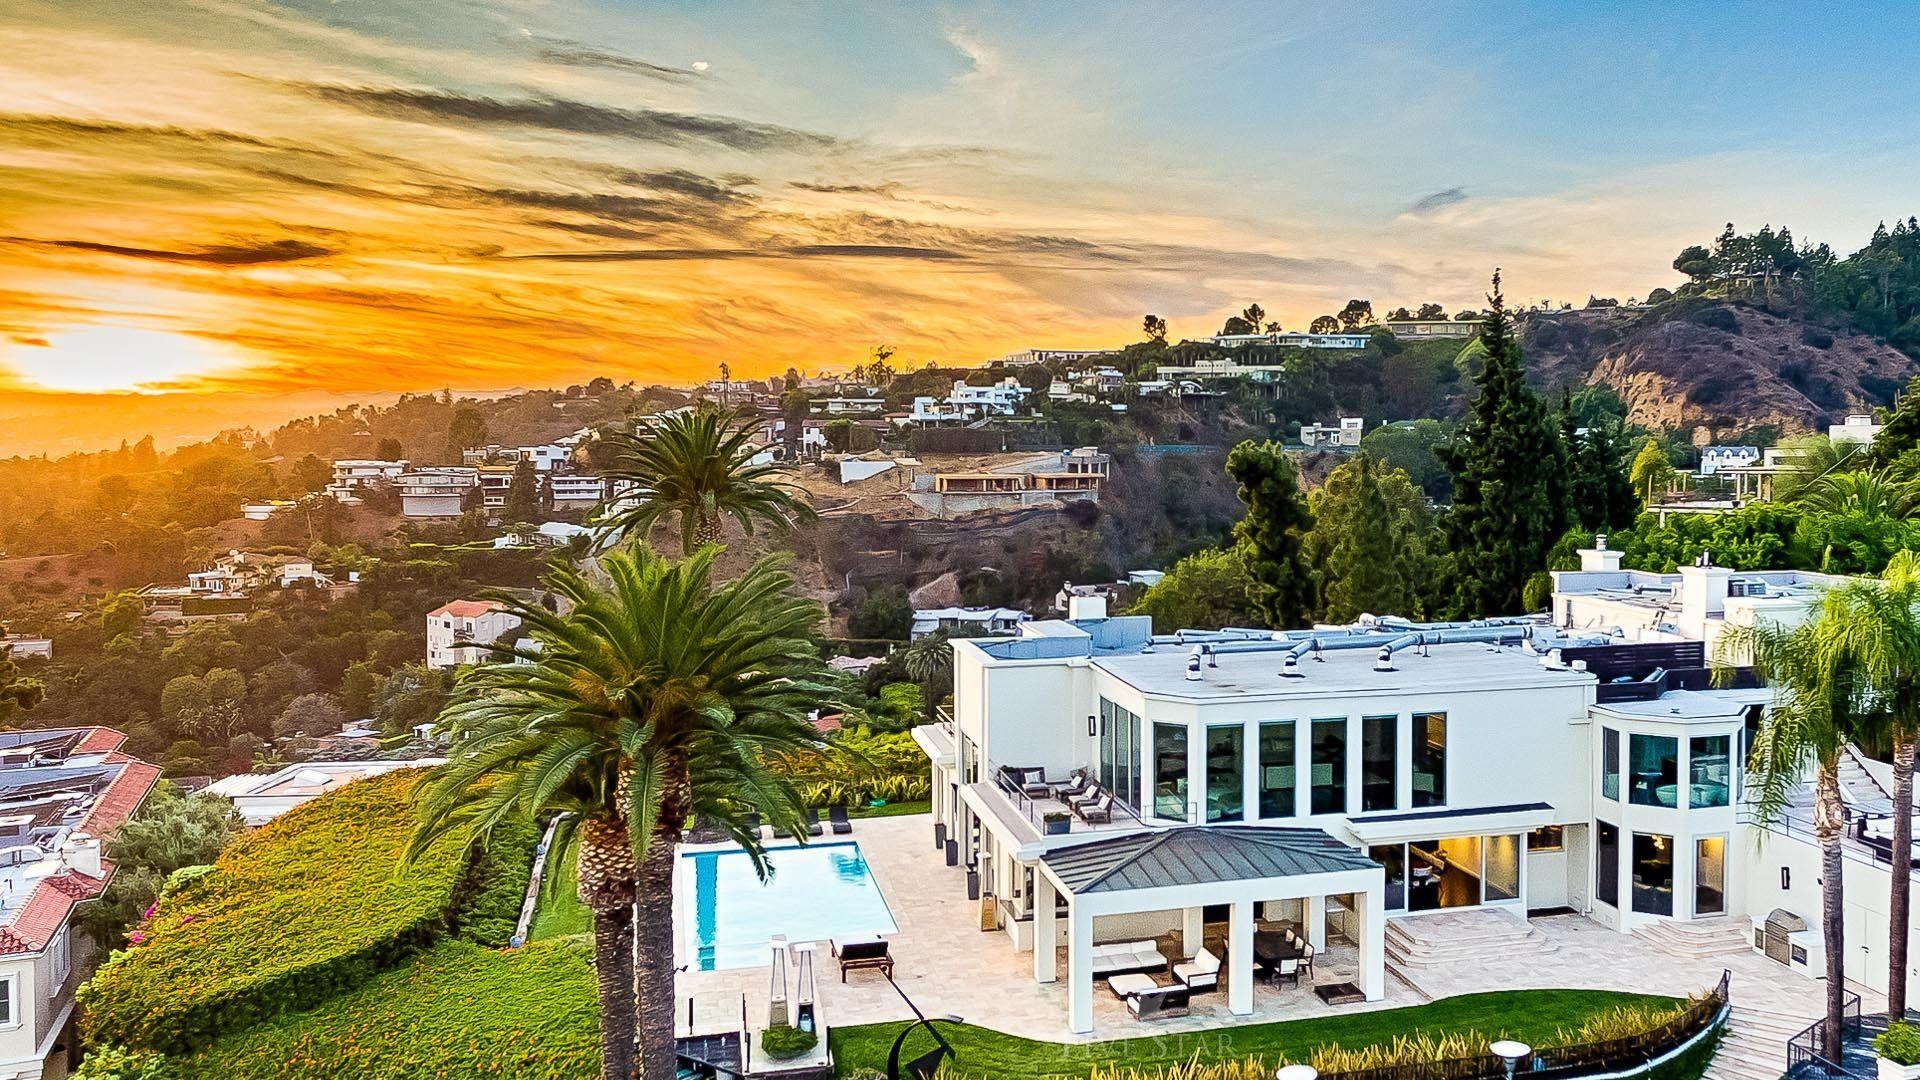 Beverly Hills Wallpaper Image